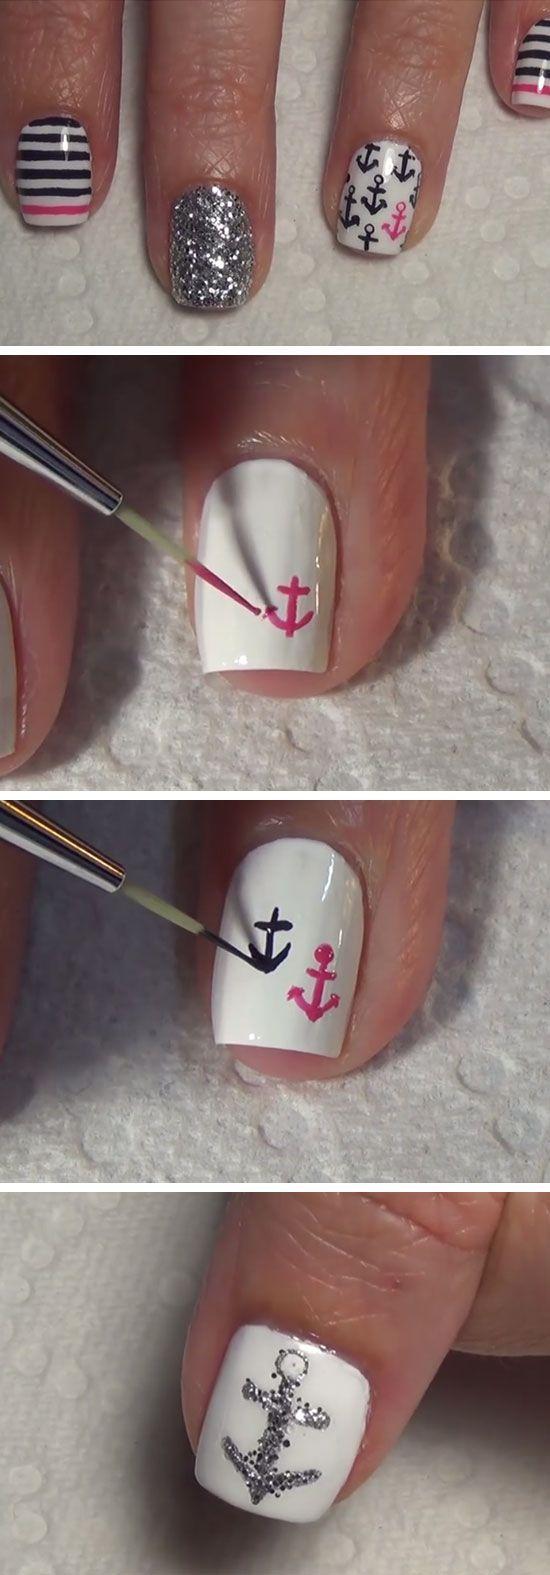 Nautical Nail Art   18 Easy Summer Nails Designs for Summer   Cute Nail Art Ideas for Teens Nail Design, Nail Art, Nail Salon, Irvine, Newport Beach